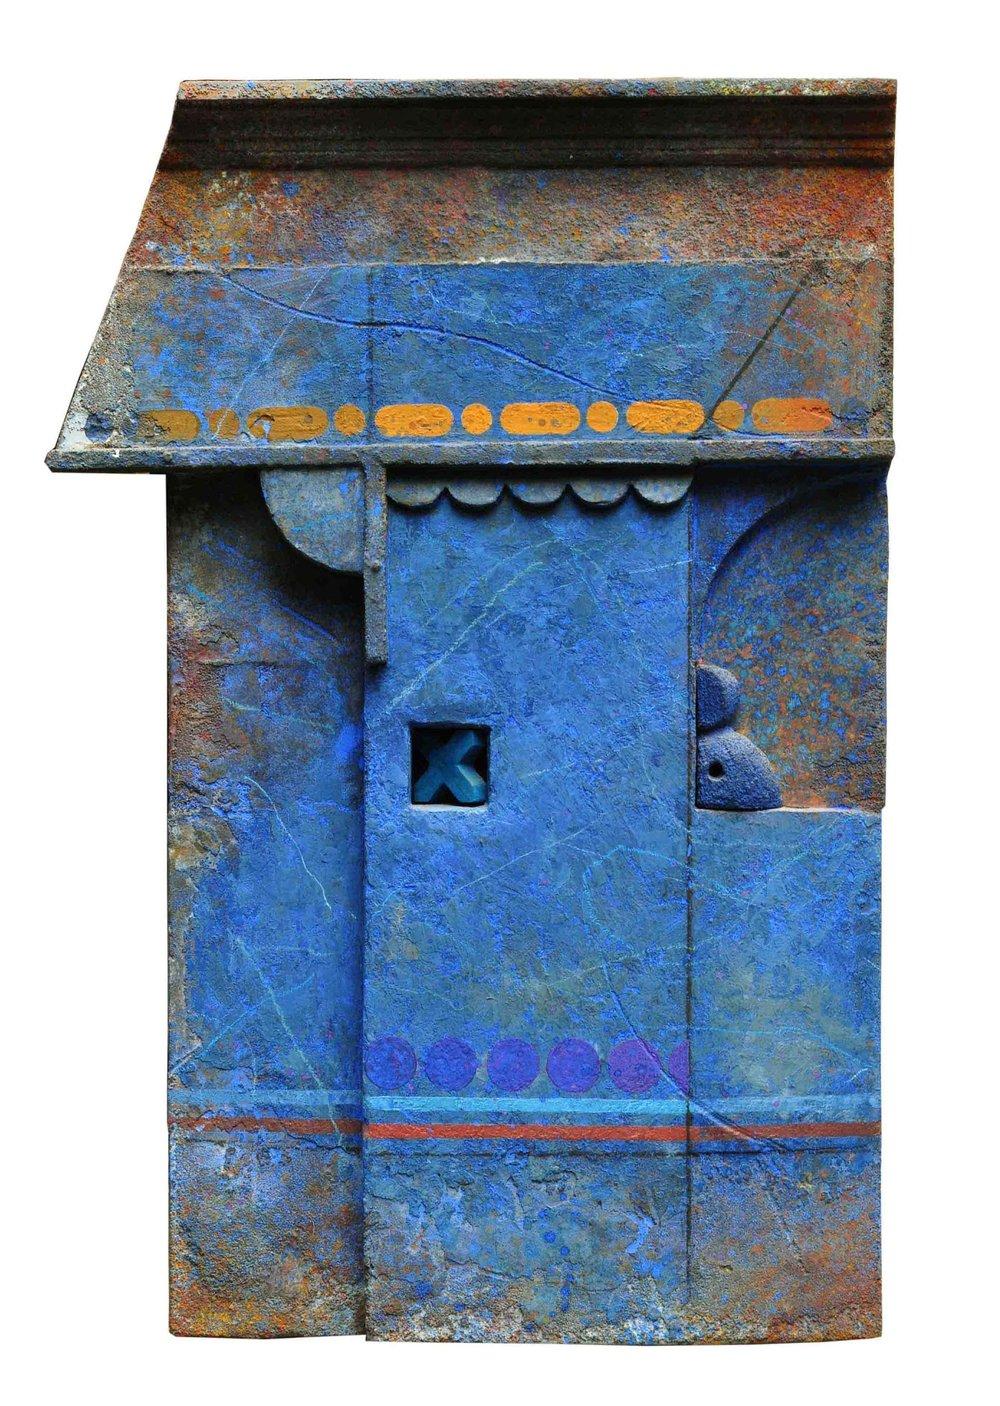 Zurbarán (Buenos Aires) .Marcelo Bonevardi, Muro Azul.  1993